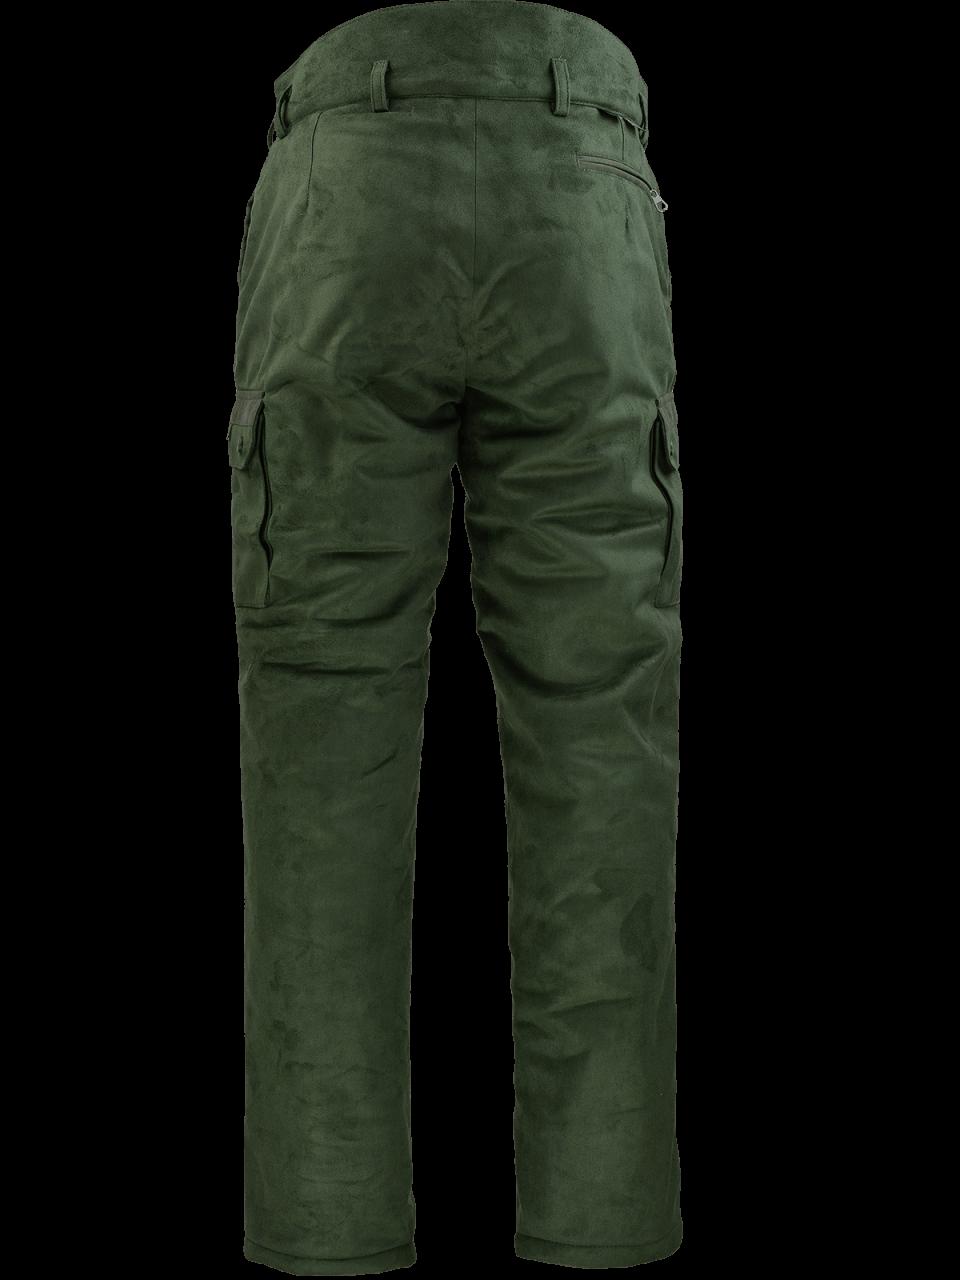 zateplené nohavice Castor outdoorové oblečenie zad